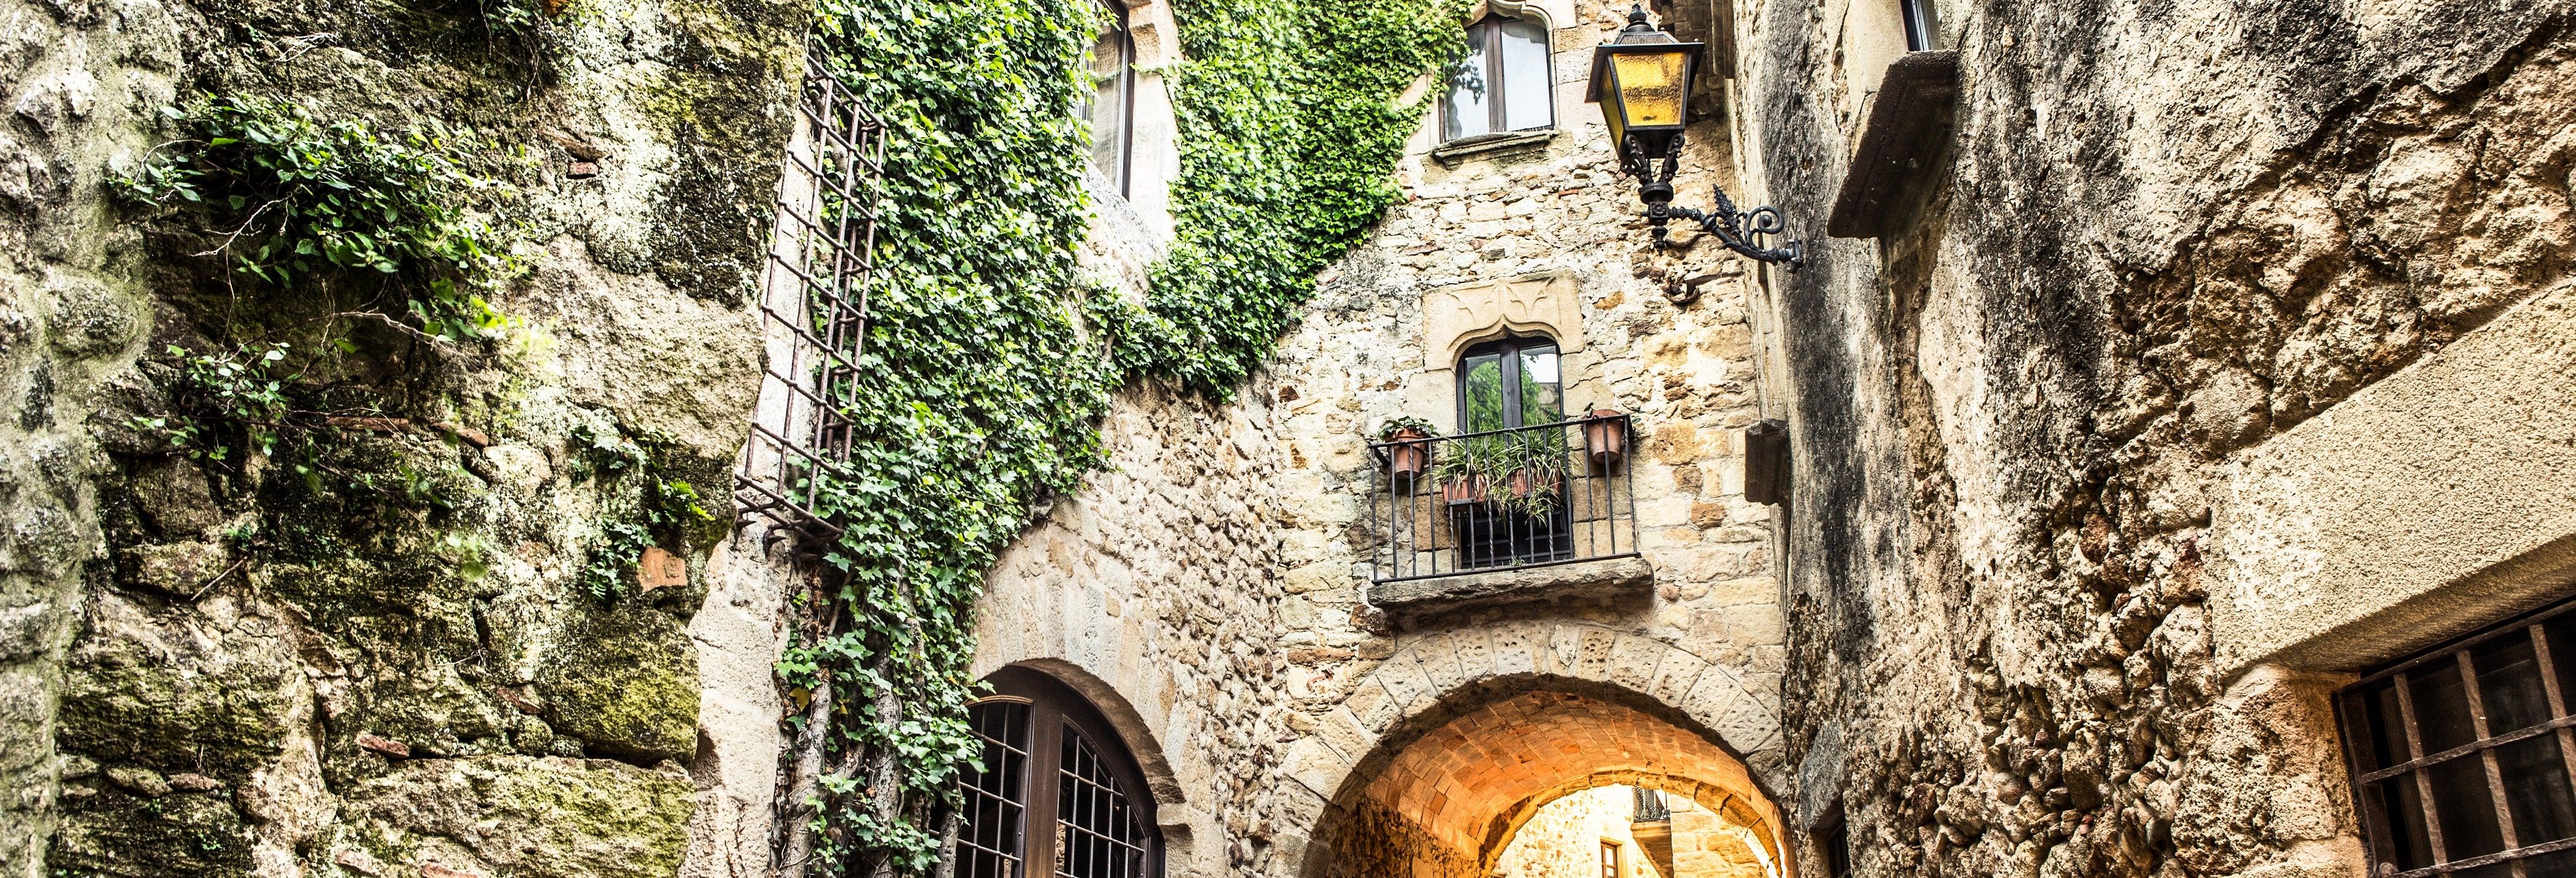 Costa Brava & Medieval Towns Tour